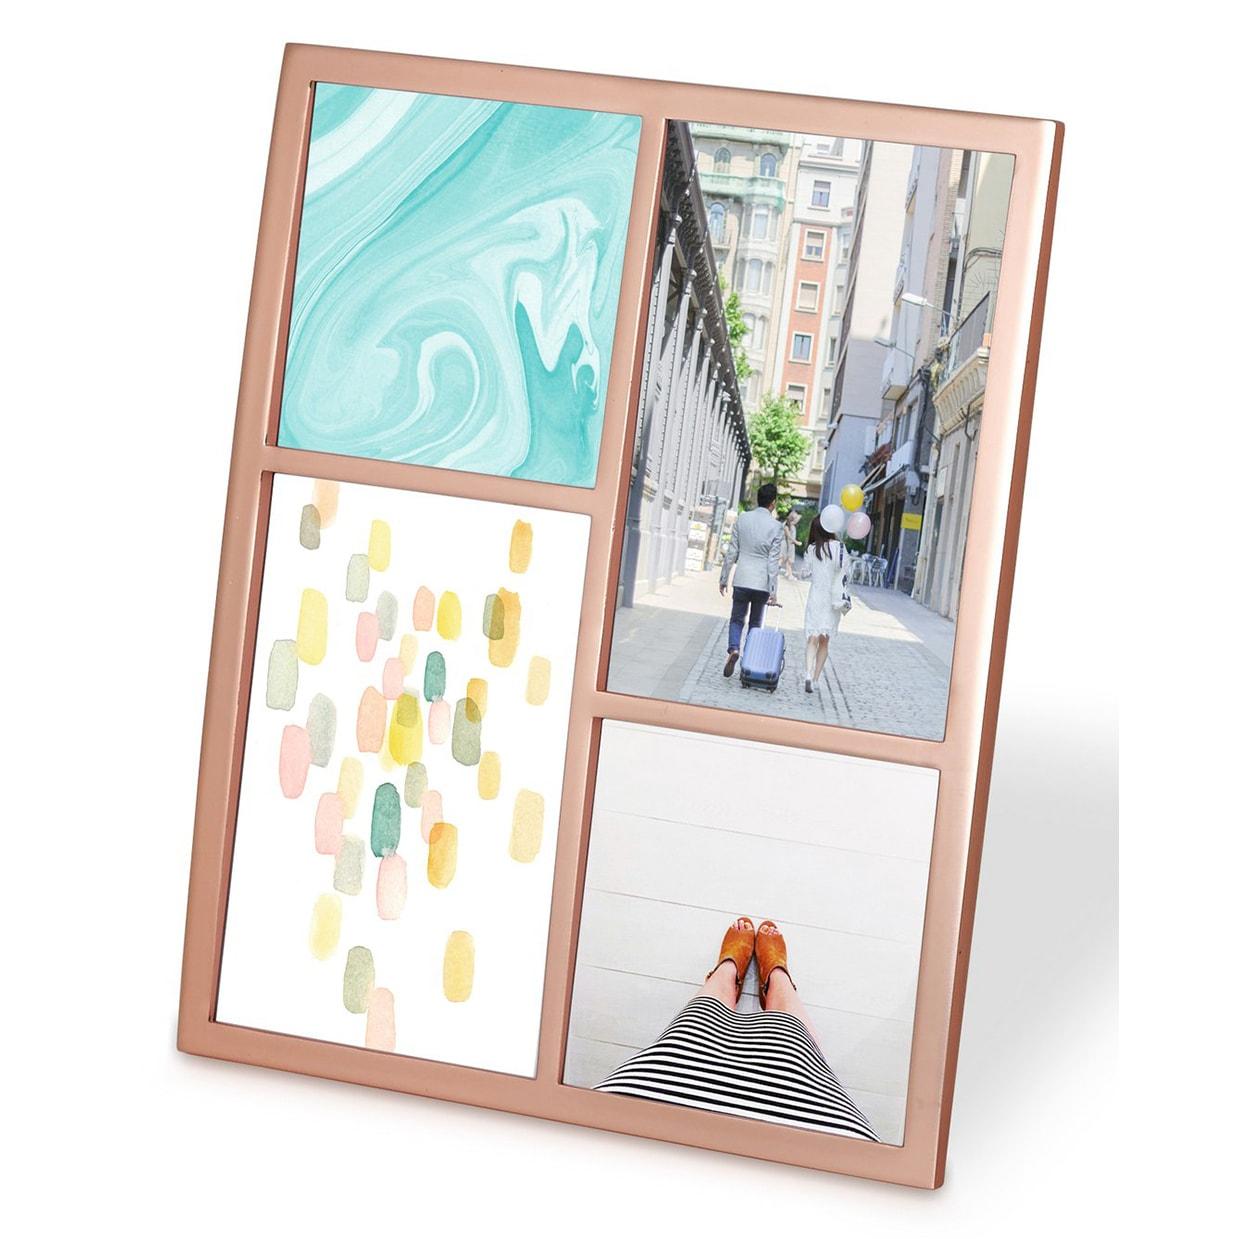 Shop Umbra Senza Multi Picture Frame Copper 1004211-880 - Free ...